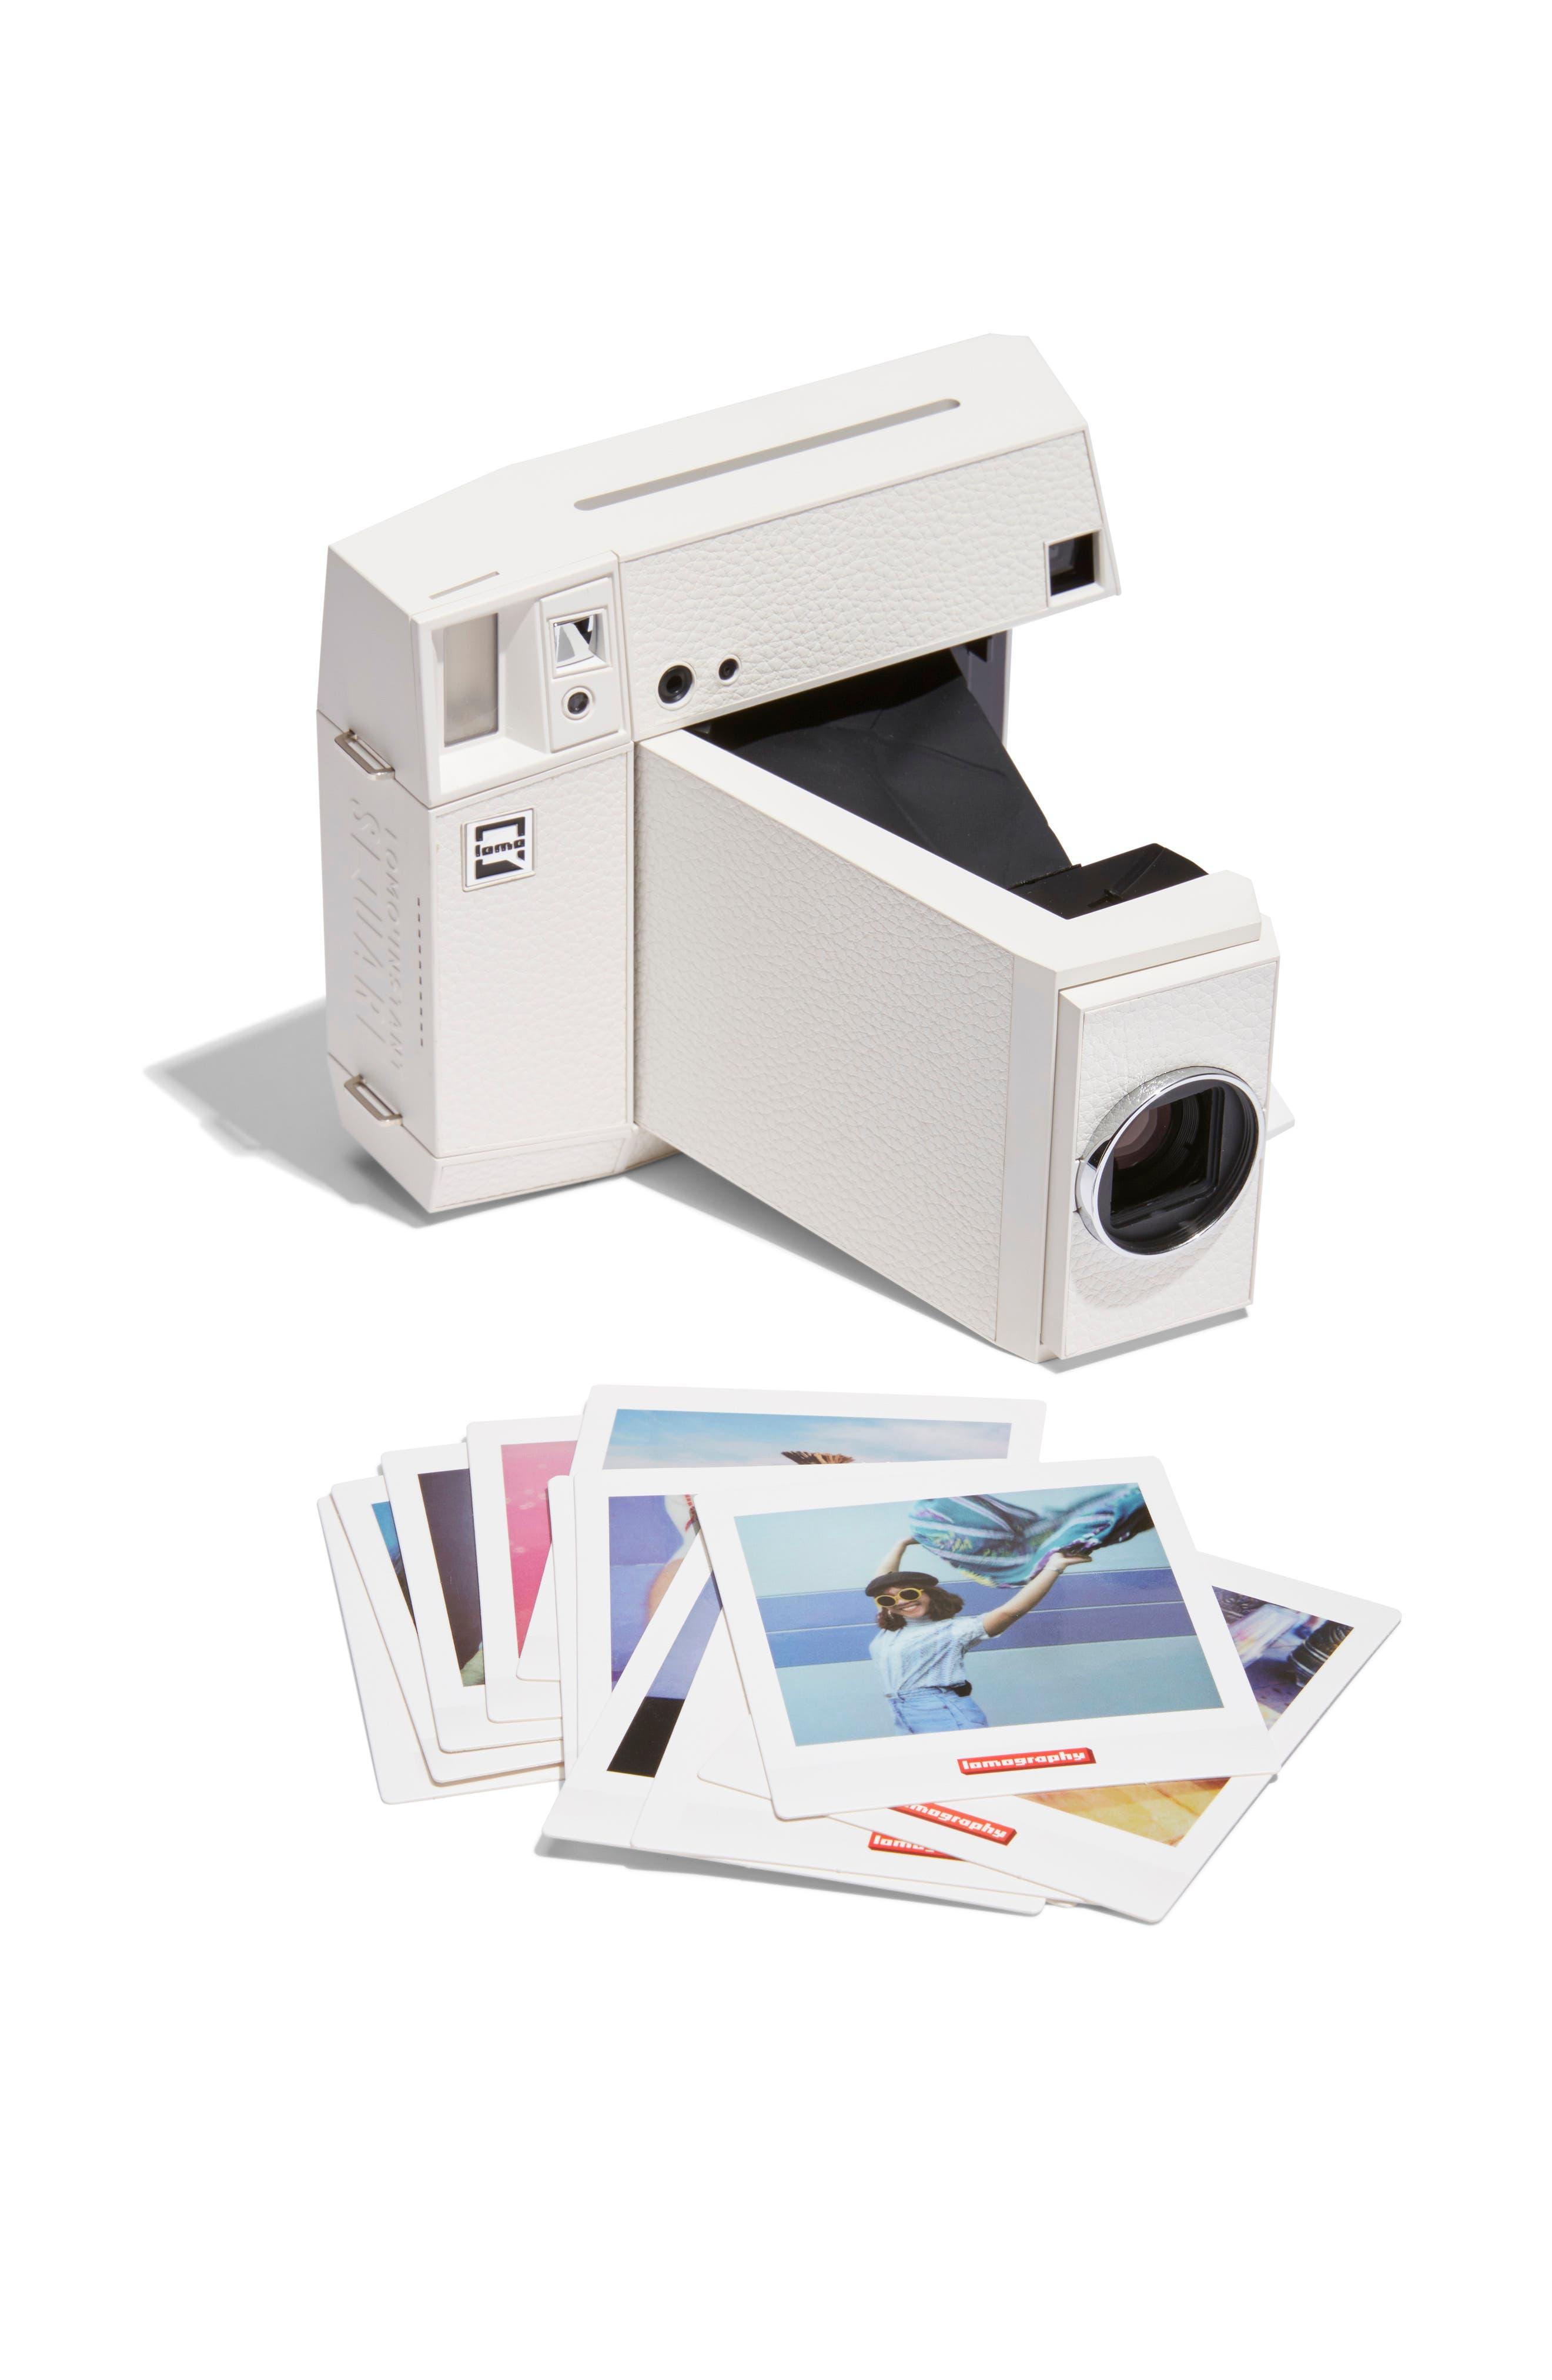 Lomo'Instant Square Glass Black Edition Instant Camera,                             Main thumbnail 1, color,                             WHITE